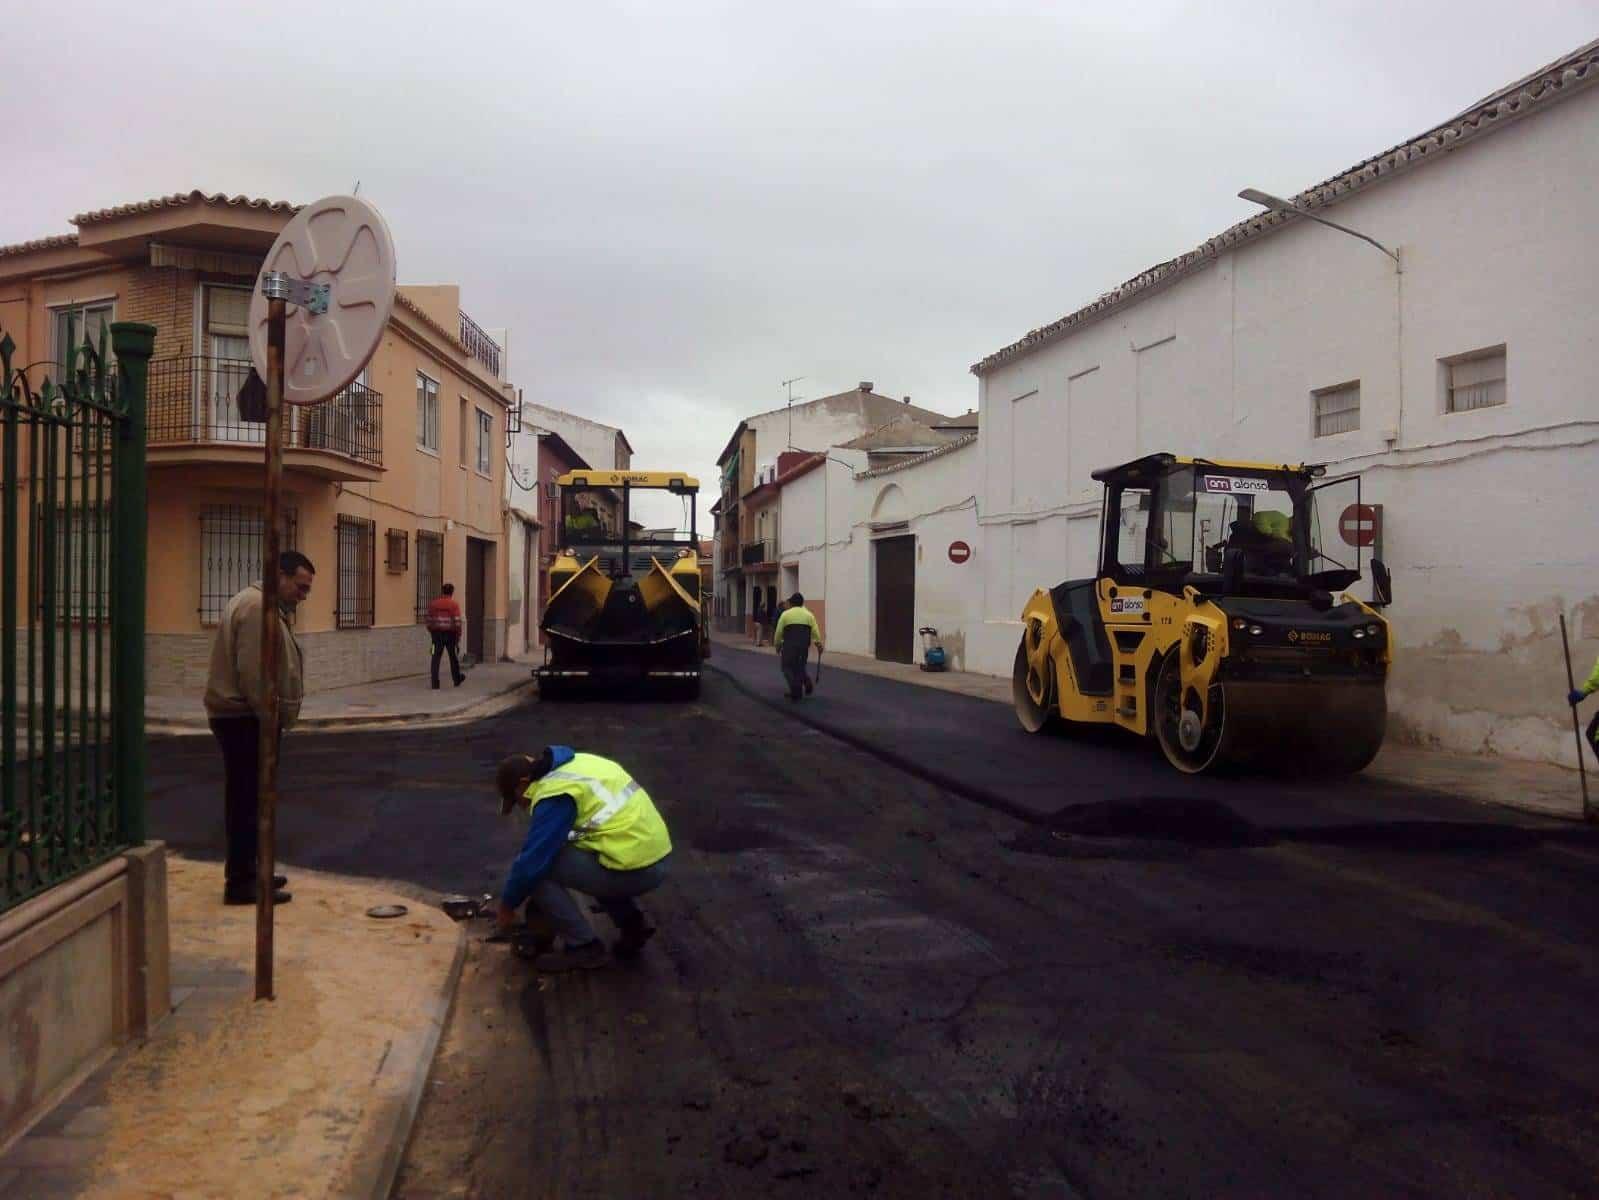 asfaltado de calles transversales herencia - Inicio del asfaltado de calles transversales de la travesía en Herencia